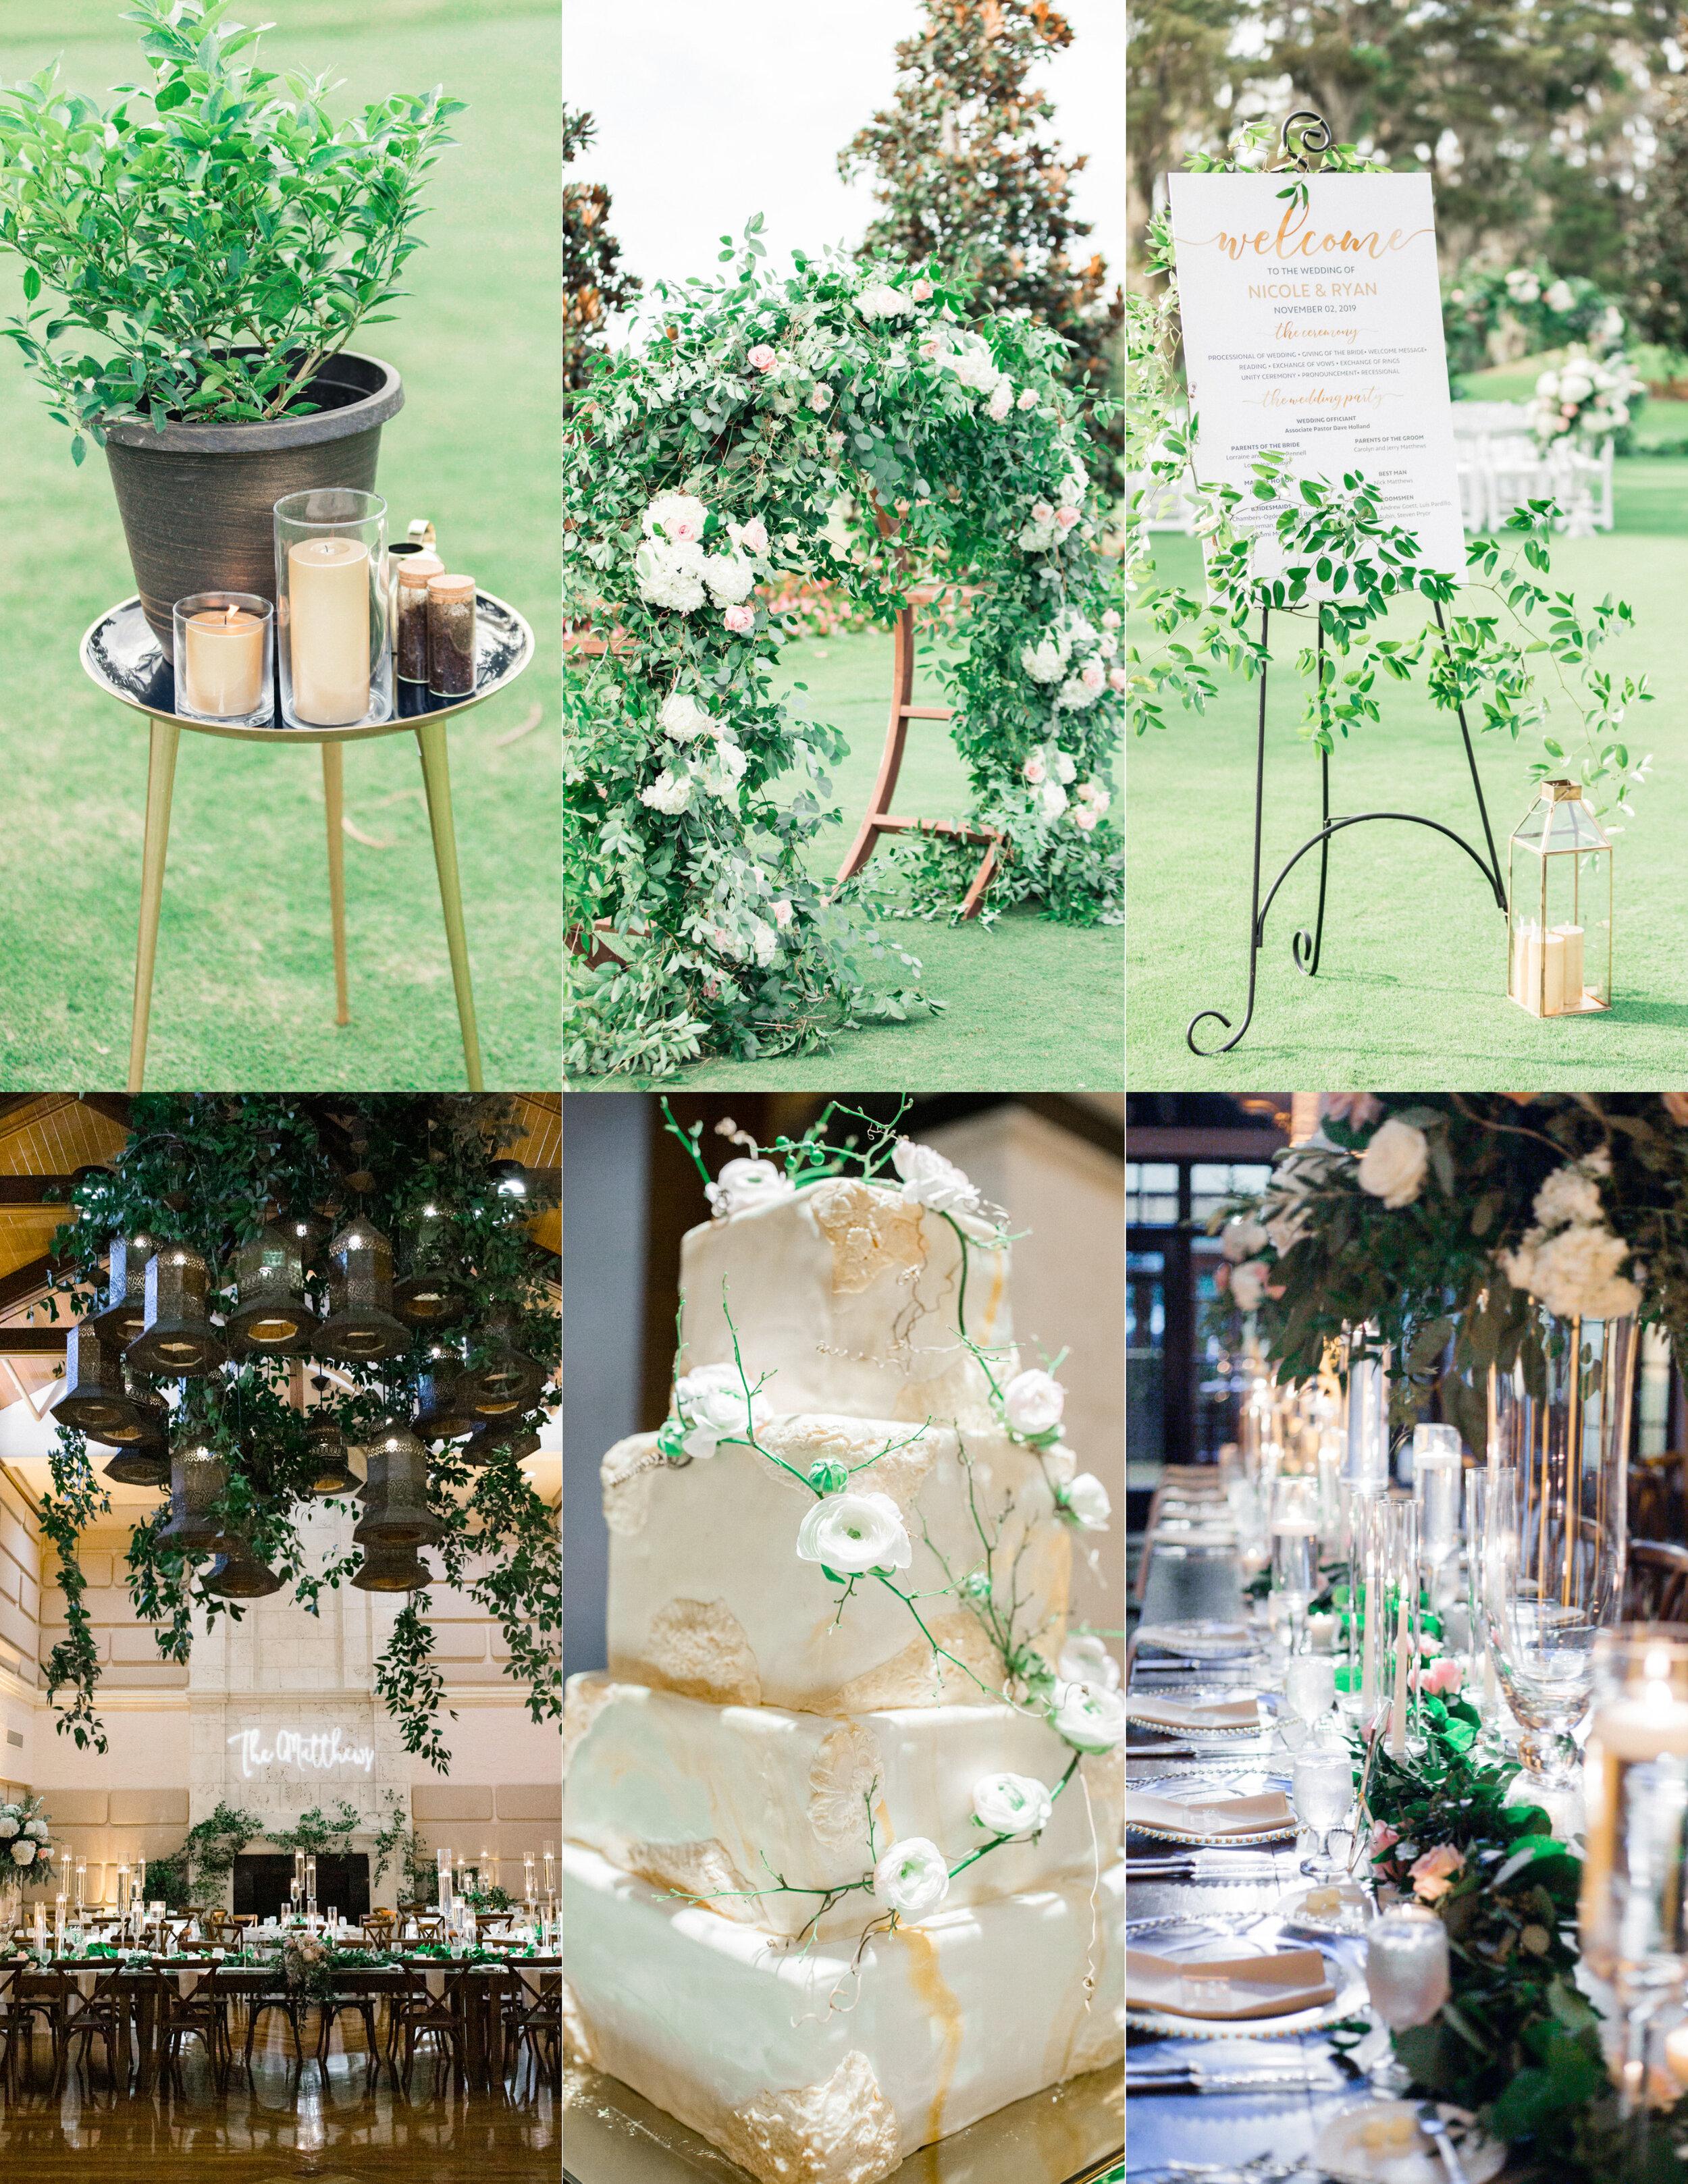 Isleworth Golf and Country Club  wedding details 3.jpg